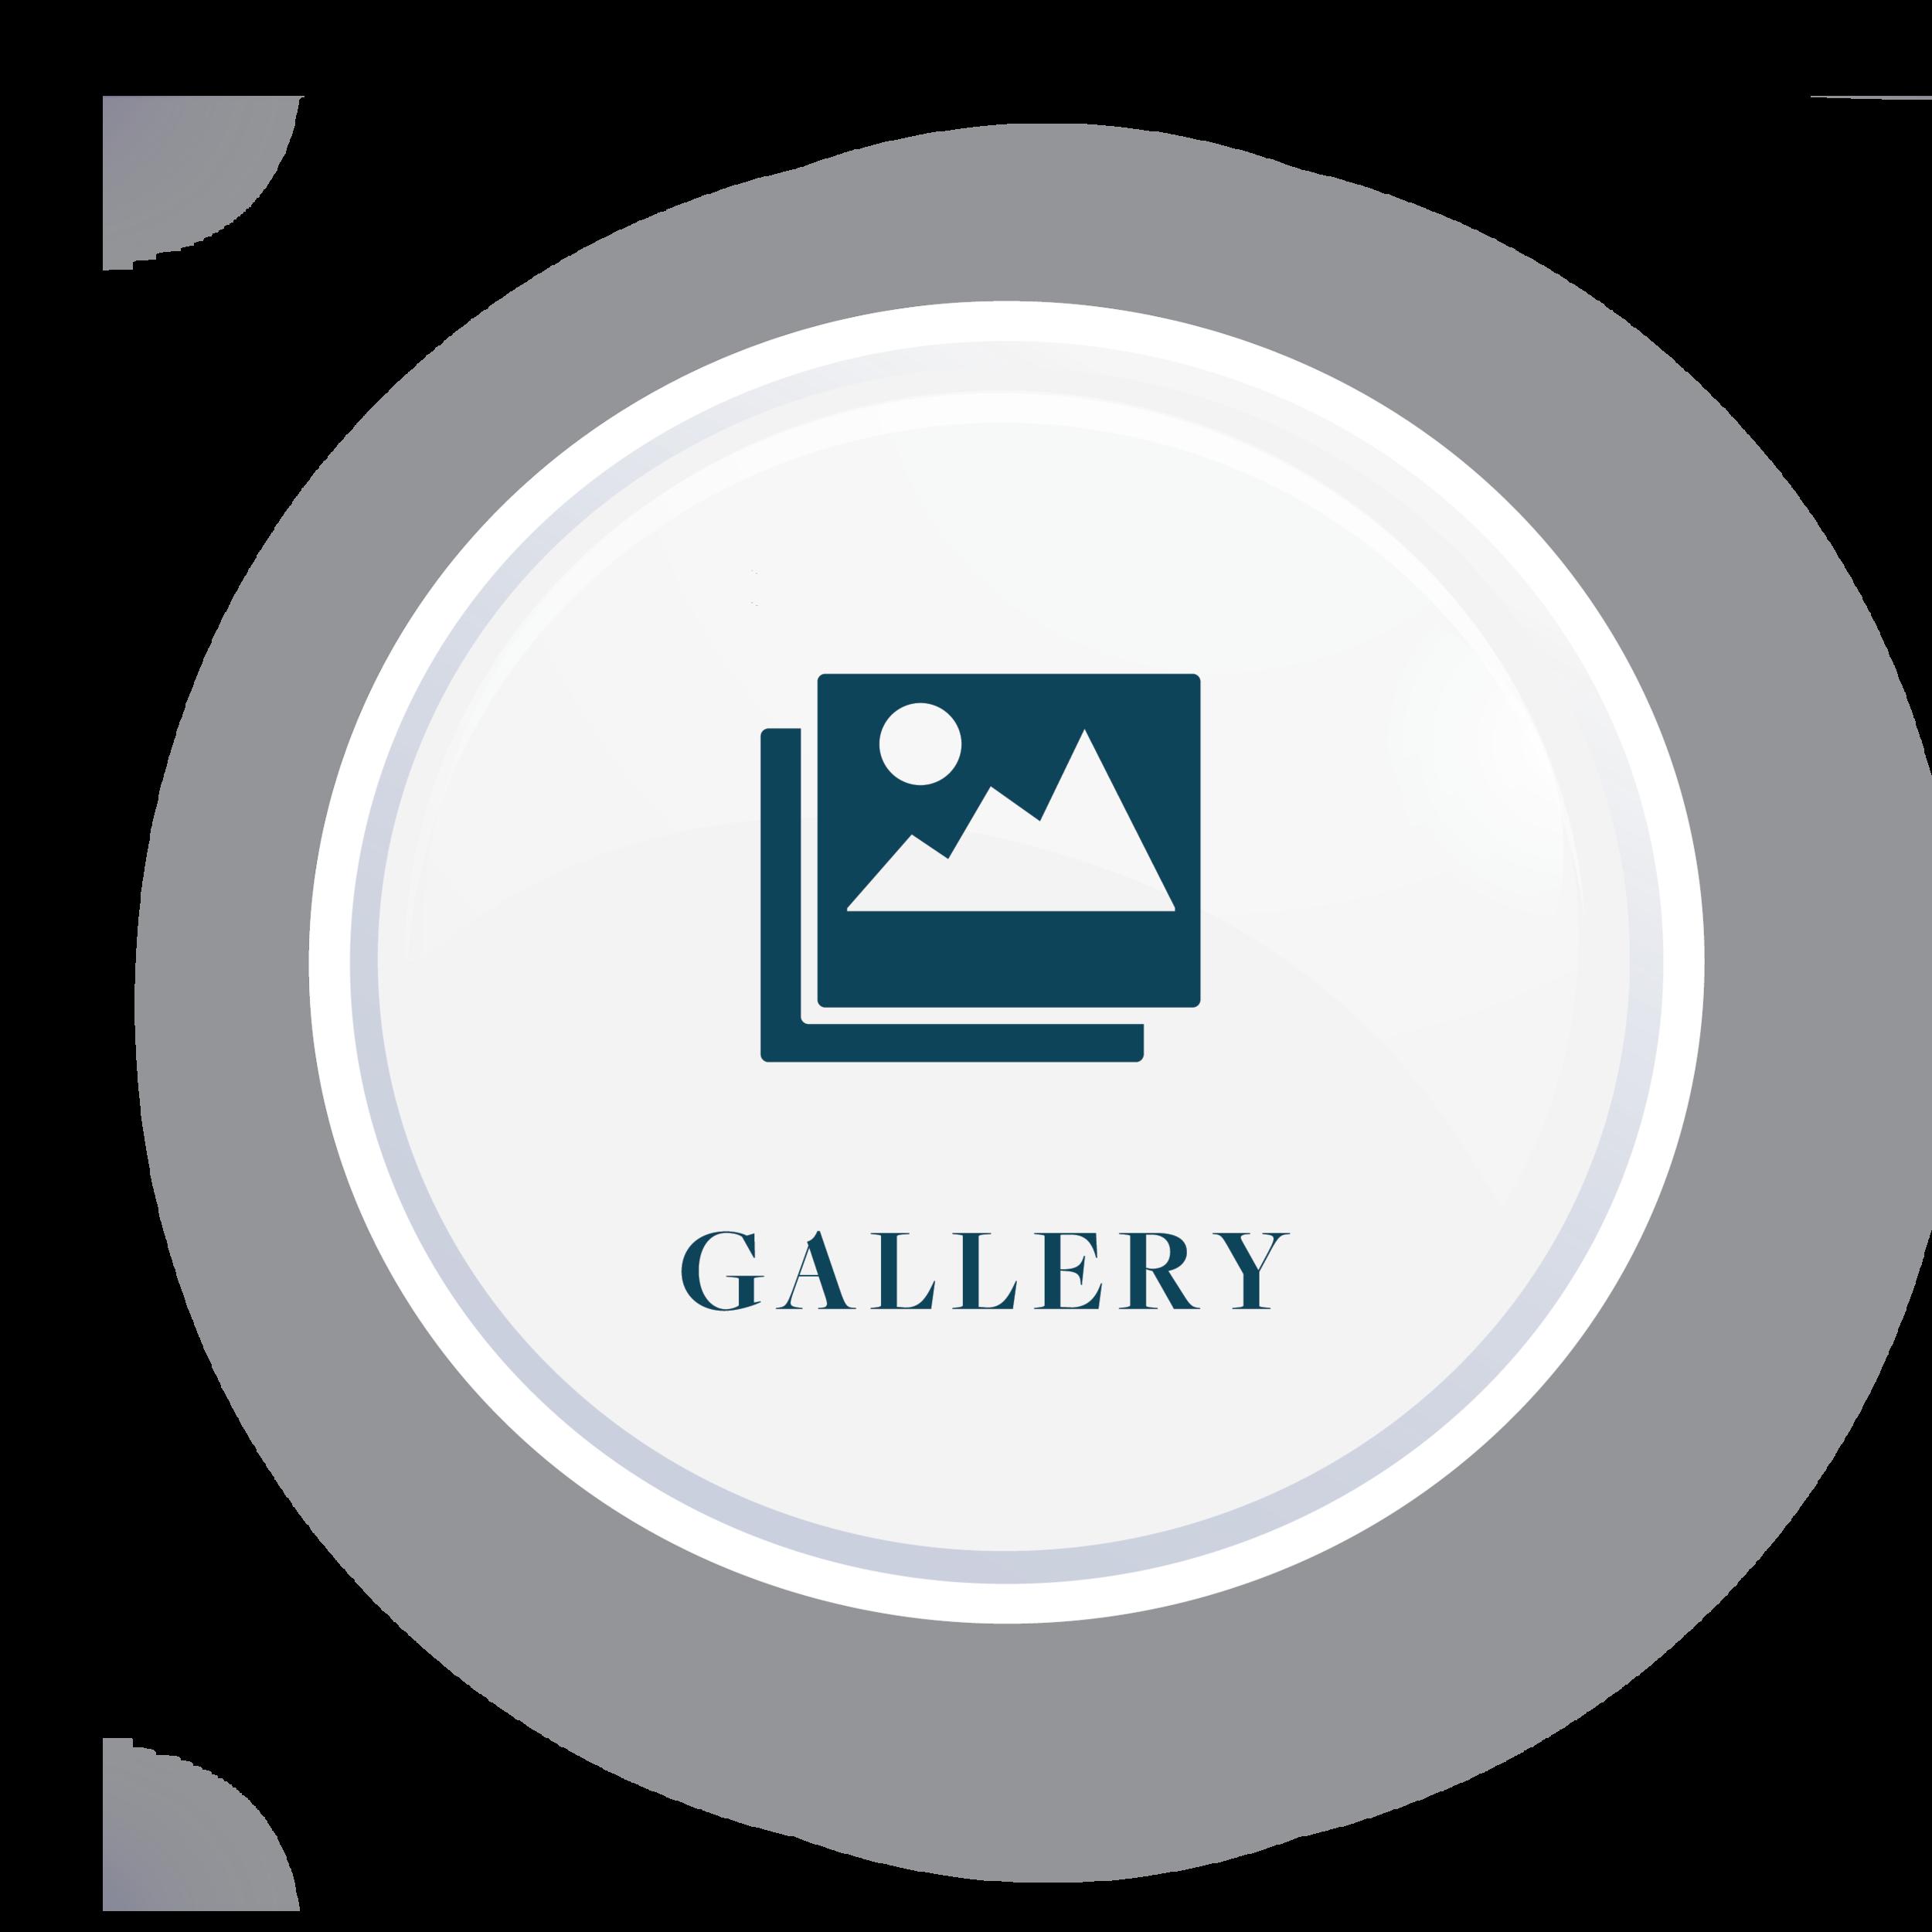 The_Tyrwhitt_Buttons-Gallery.png